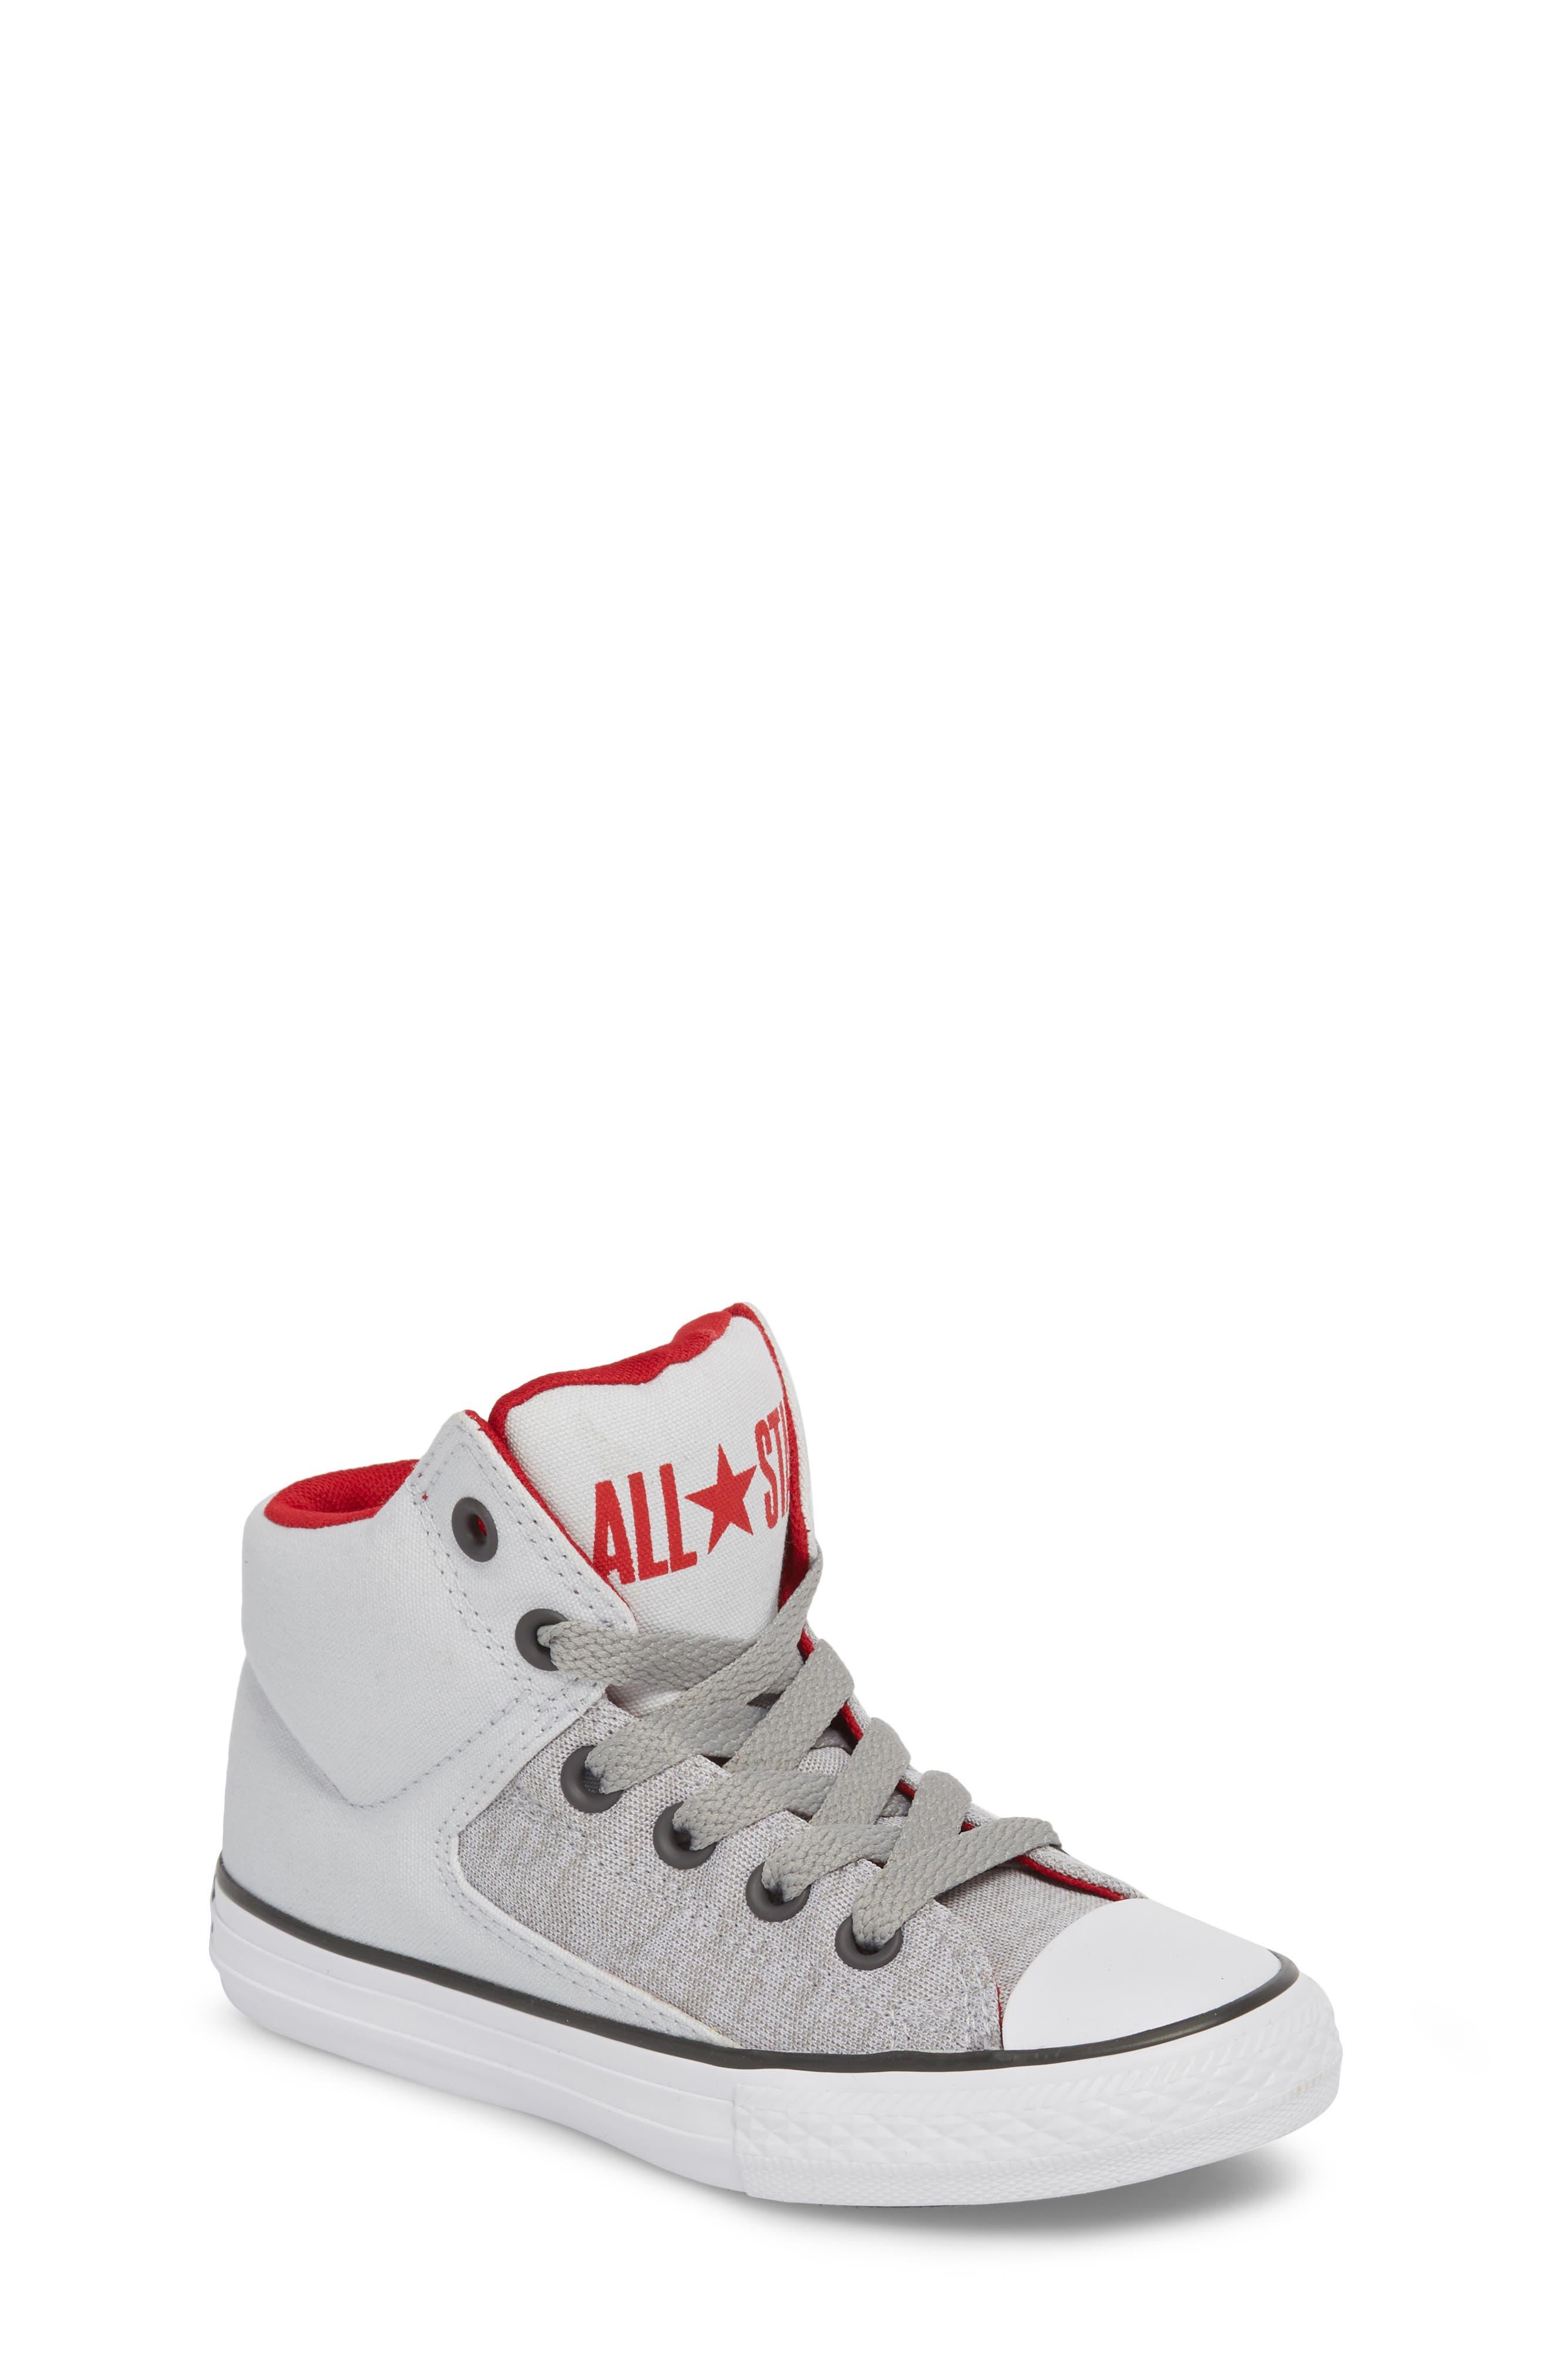 Chuck Taylor<sup>®</sup> All Star<sup>®</sup> High Street High Top Sneaker,                             Main thumbnail 2, color,